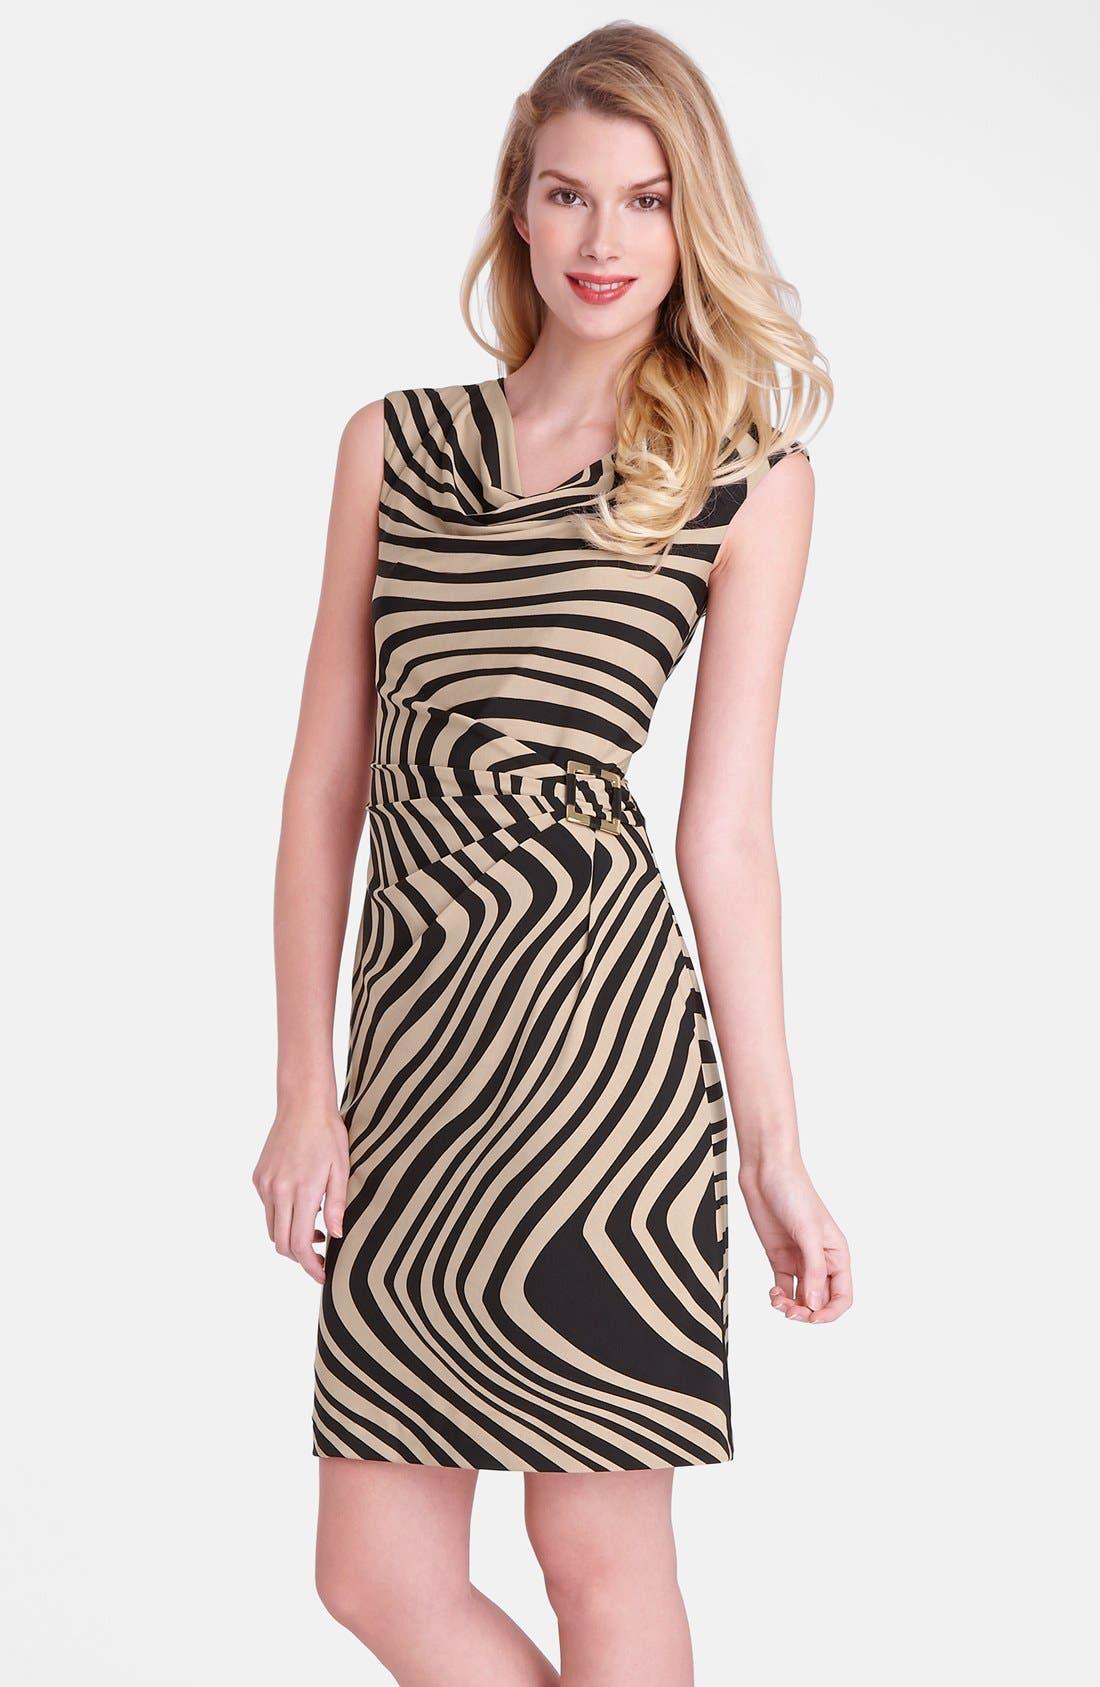 Alternate Image 1 Selected - Tahari 'Wave' Print Cowl Neck Sheath Dress